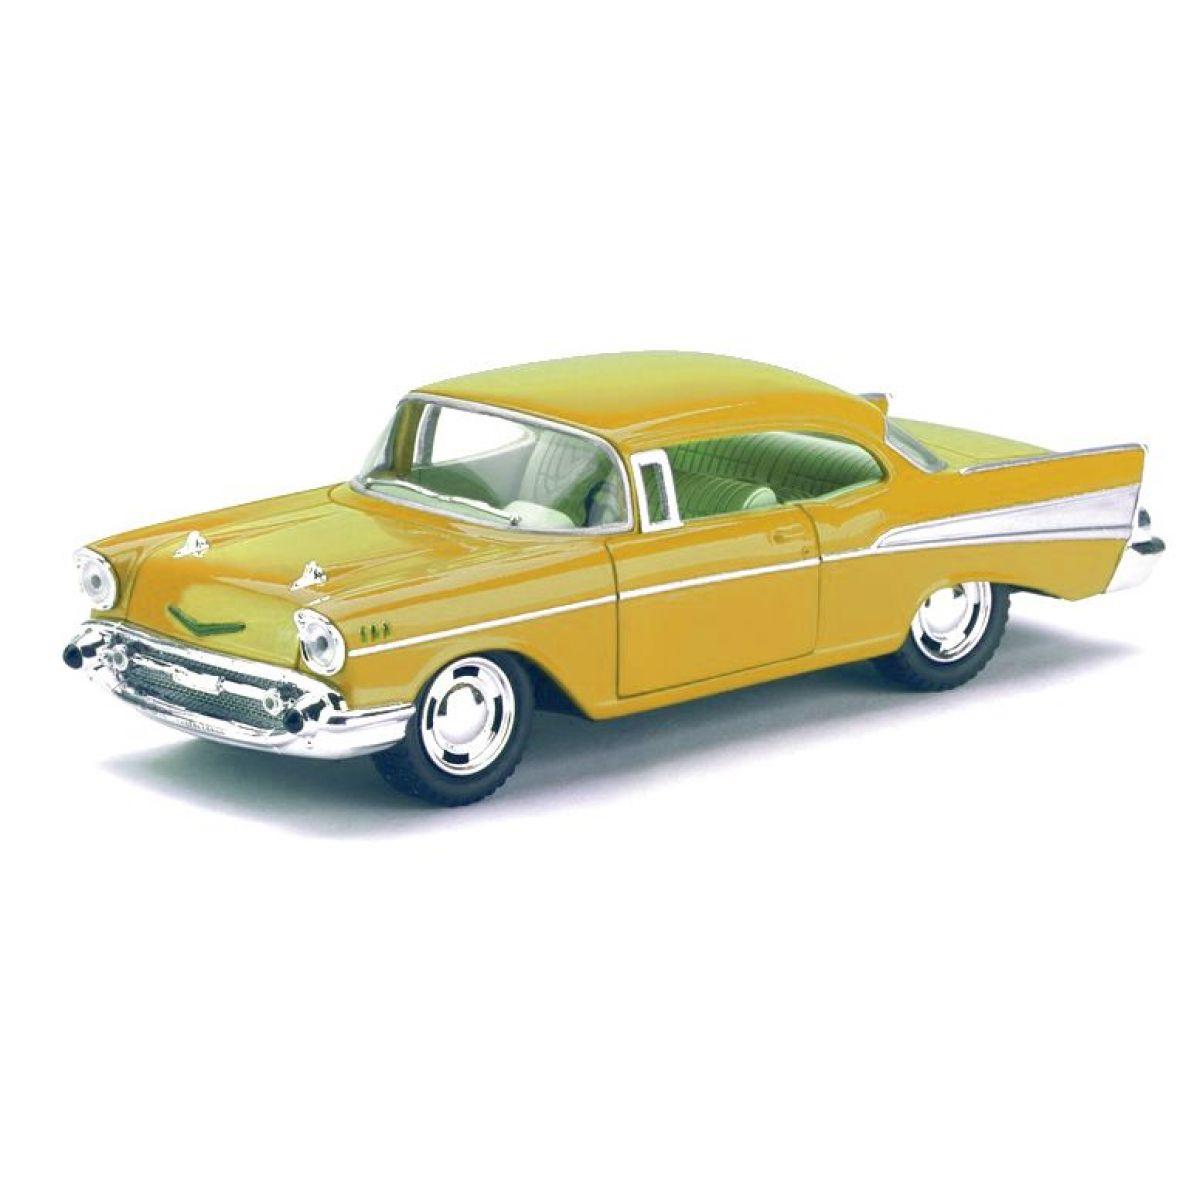 HM Studio Auto Chevrolet Bel Air 1957 - Žlutá